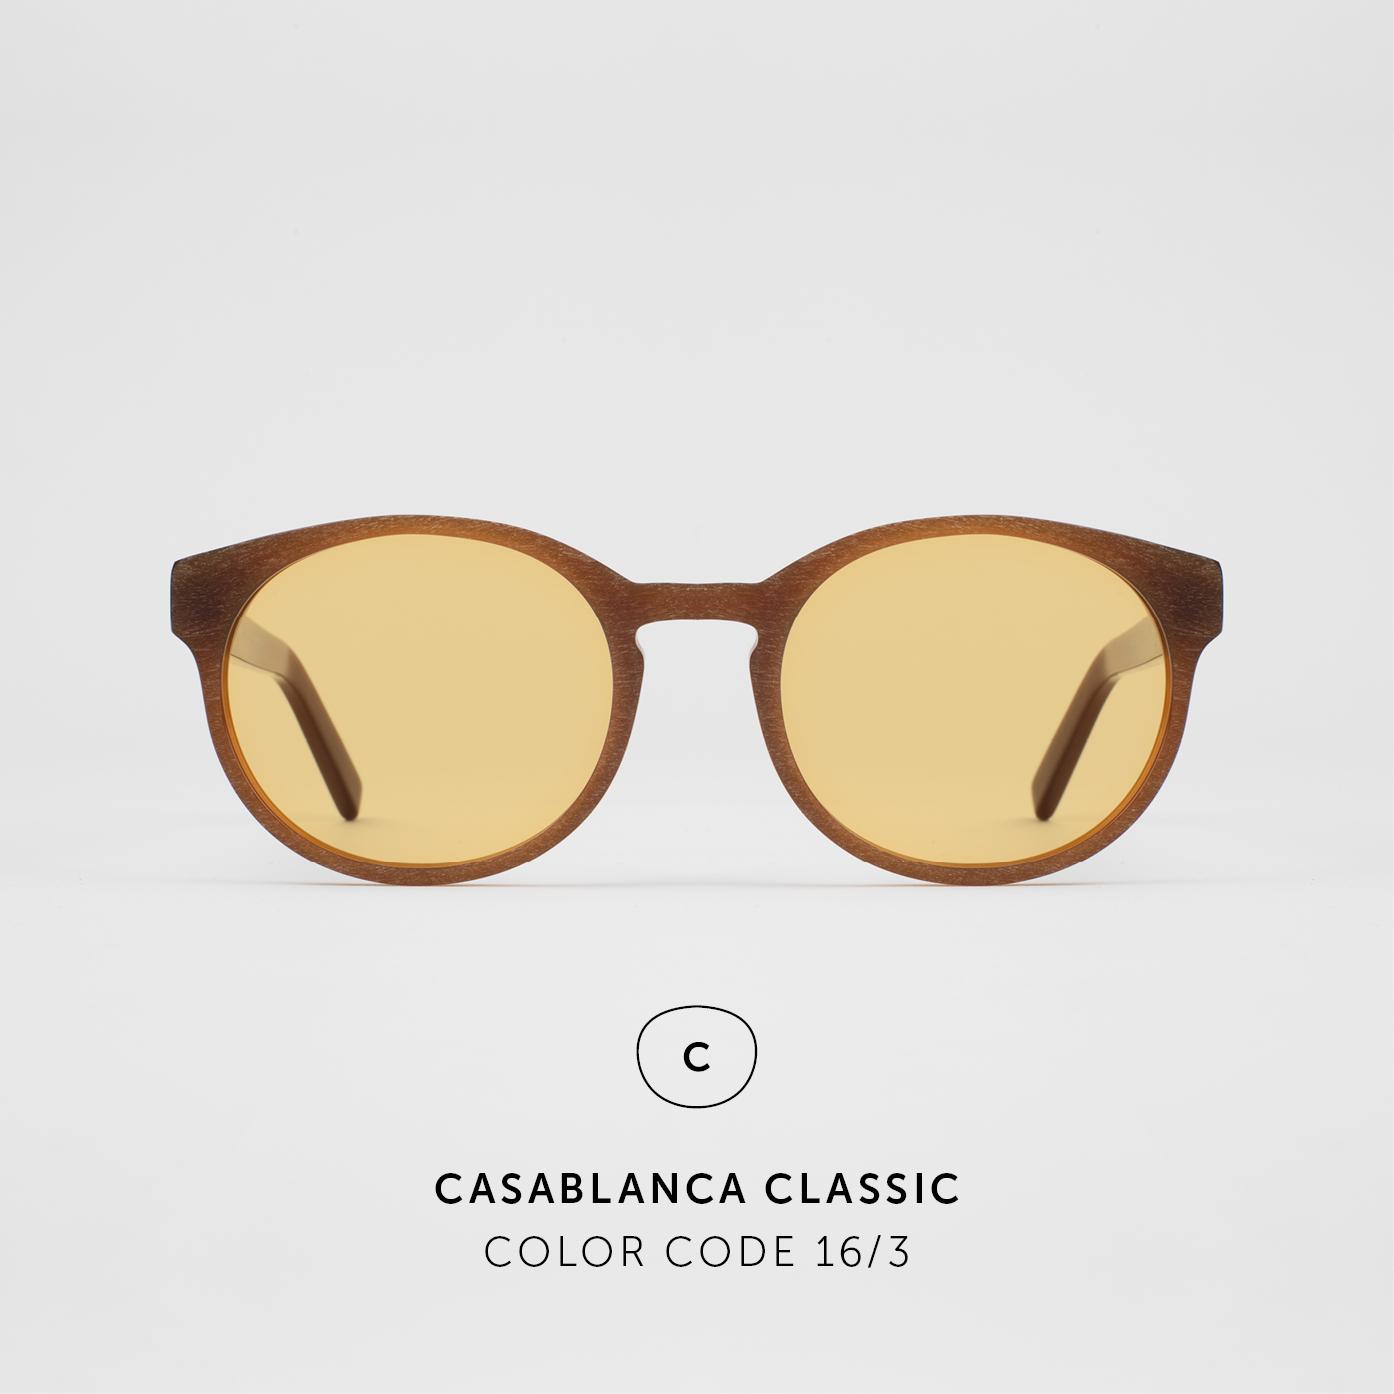 CasablancaClassic48.jpg